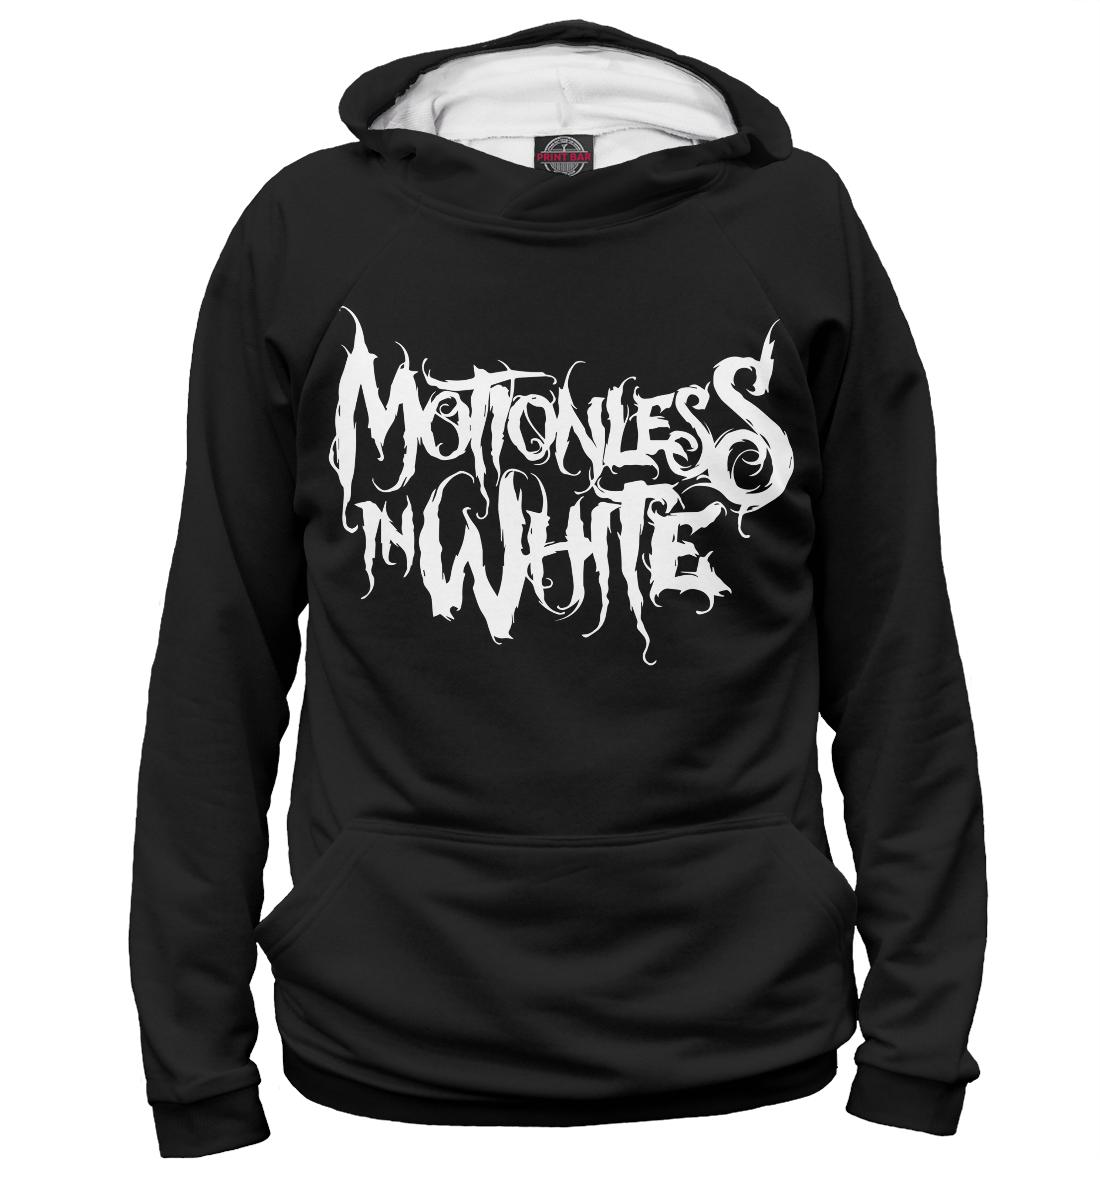 Купить Motionless In White, Printbar, Худи, MZK-578137-hud-1